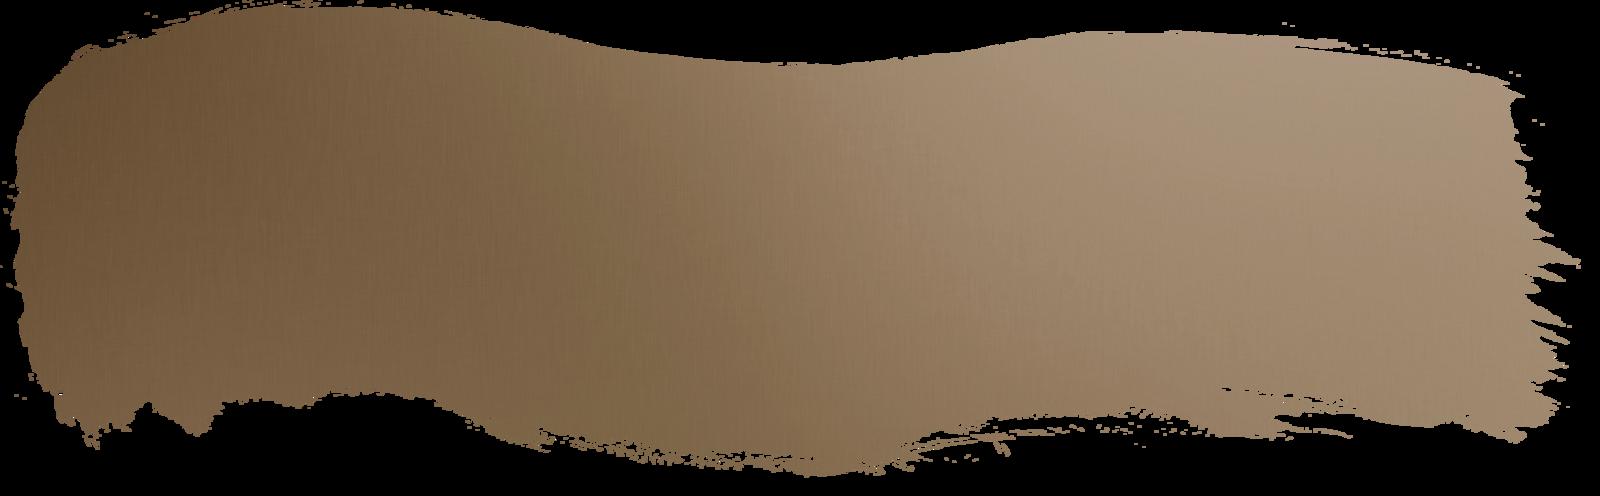 bronze brush stroke